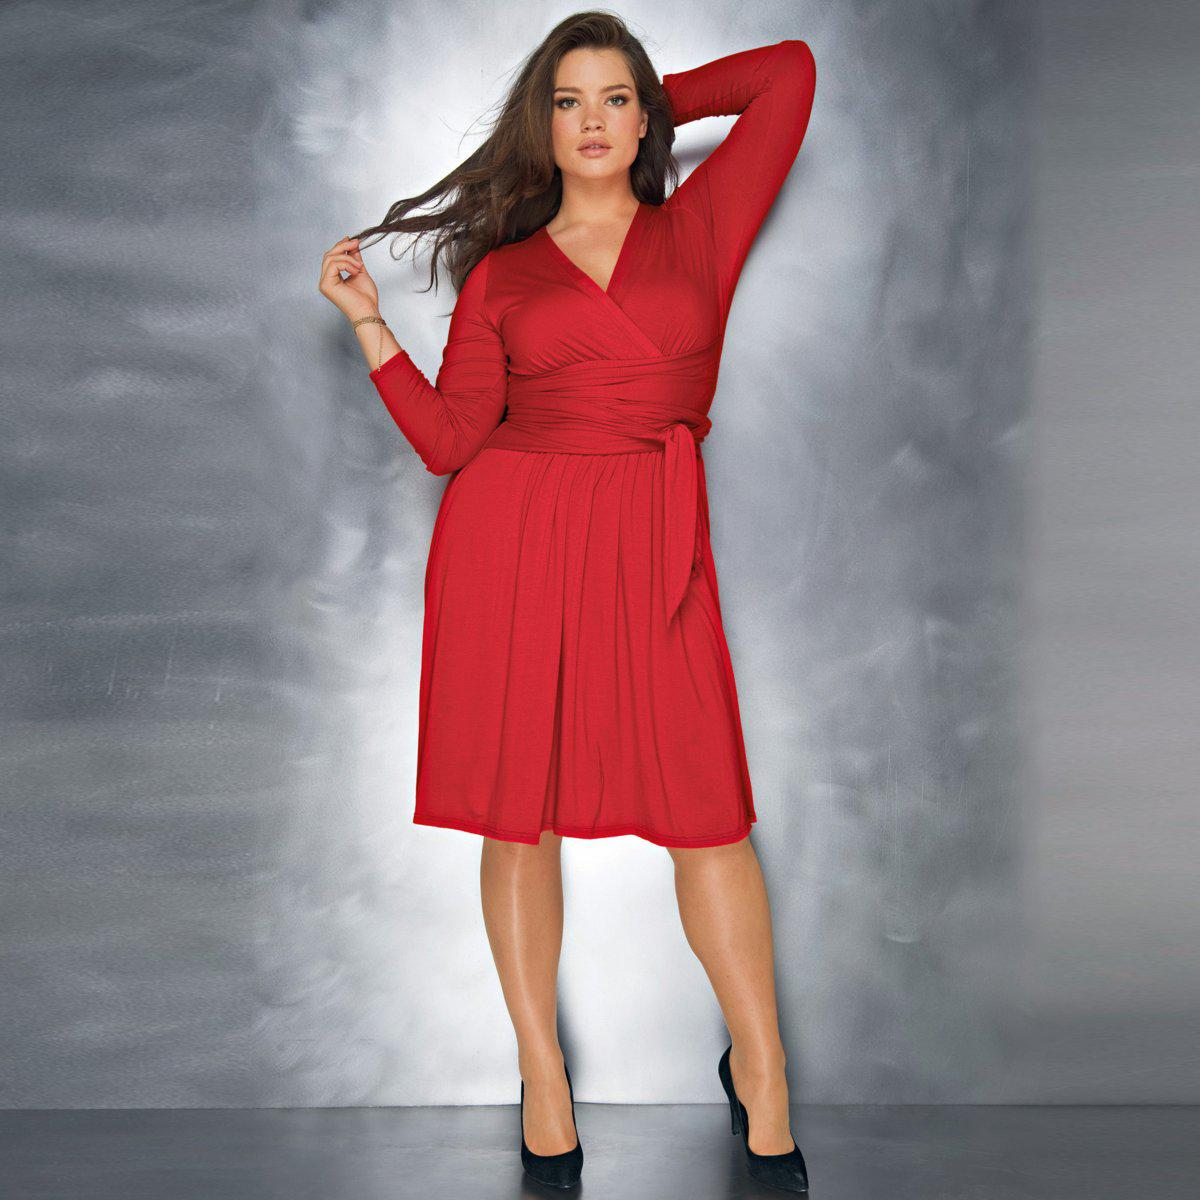 ac4e7caa115d Βραδυνα Φορεματα Μεγαλα Μεγεθη Φθινόπωρο 2011 κωδ. 324245195